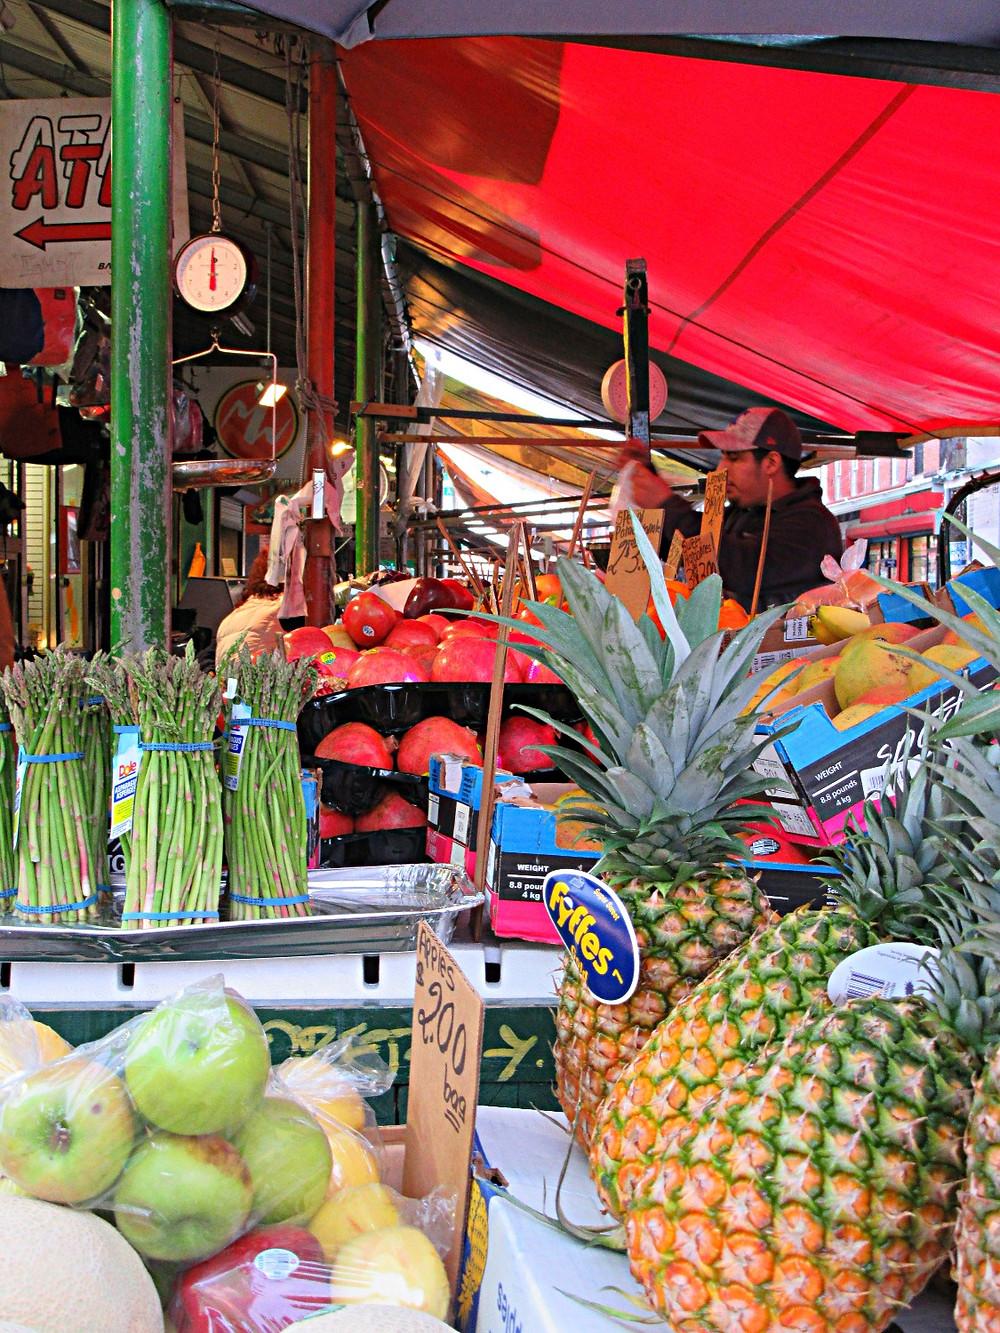 Traveleidsocope:  Italian Market, Philadelphia